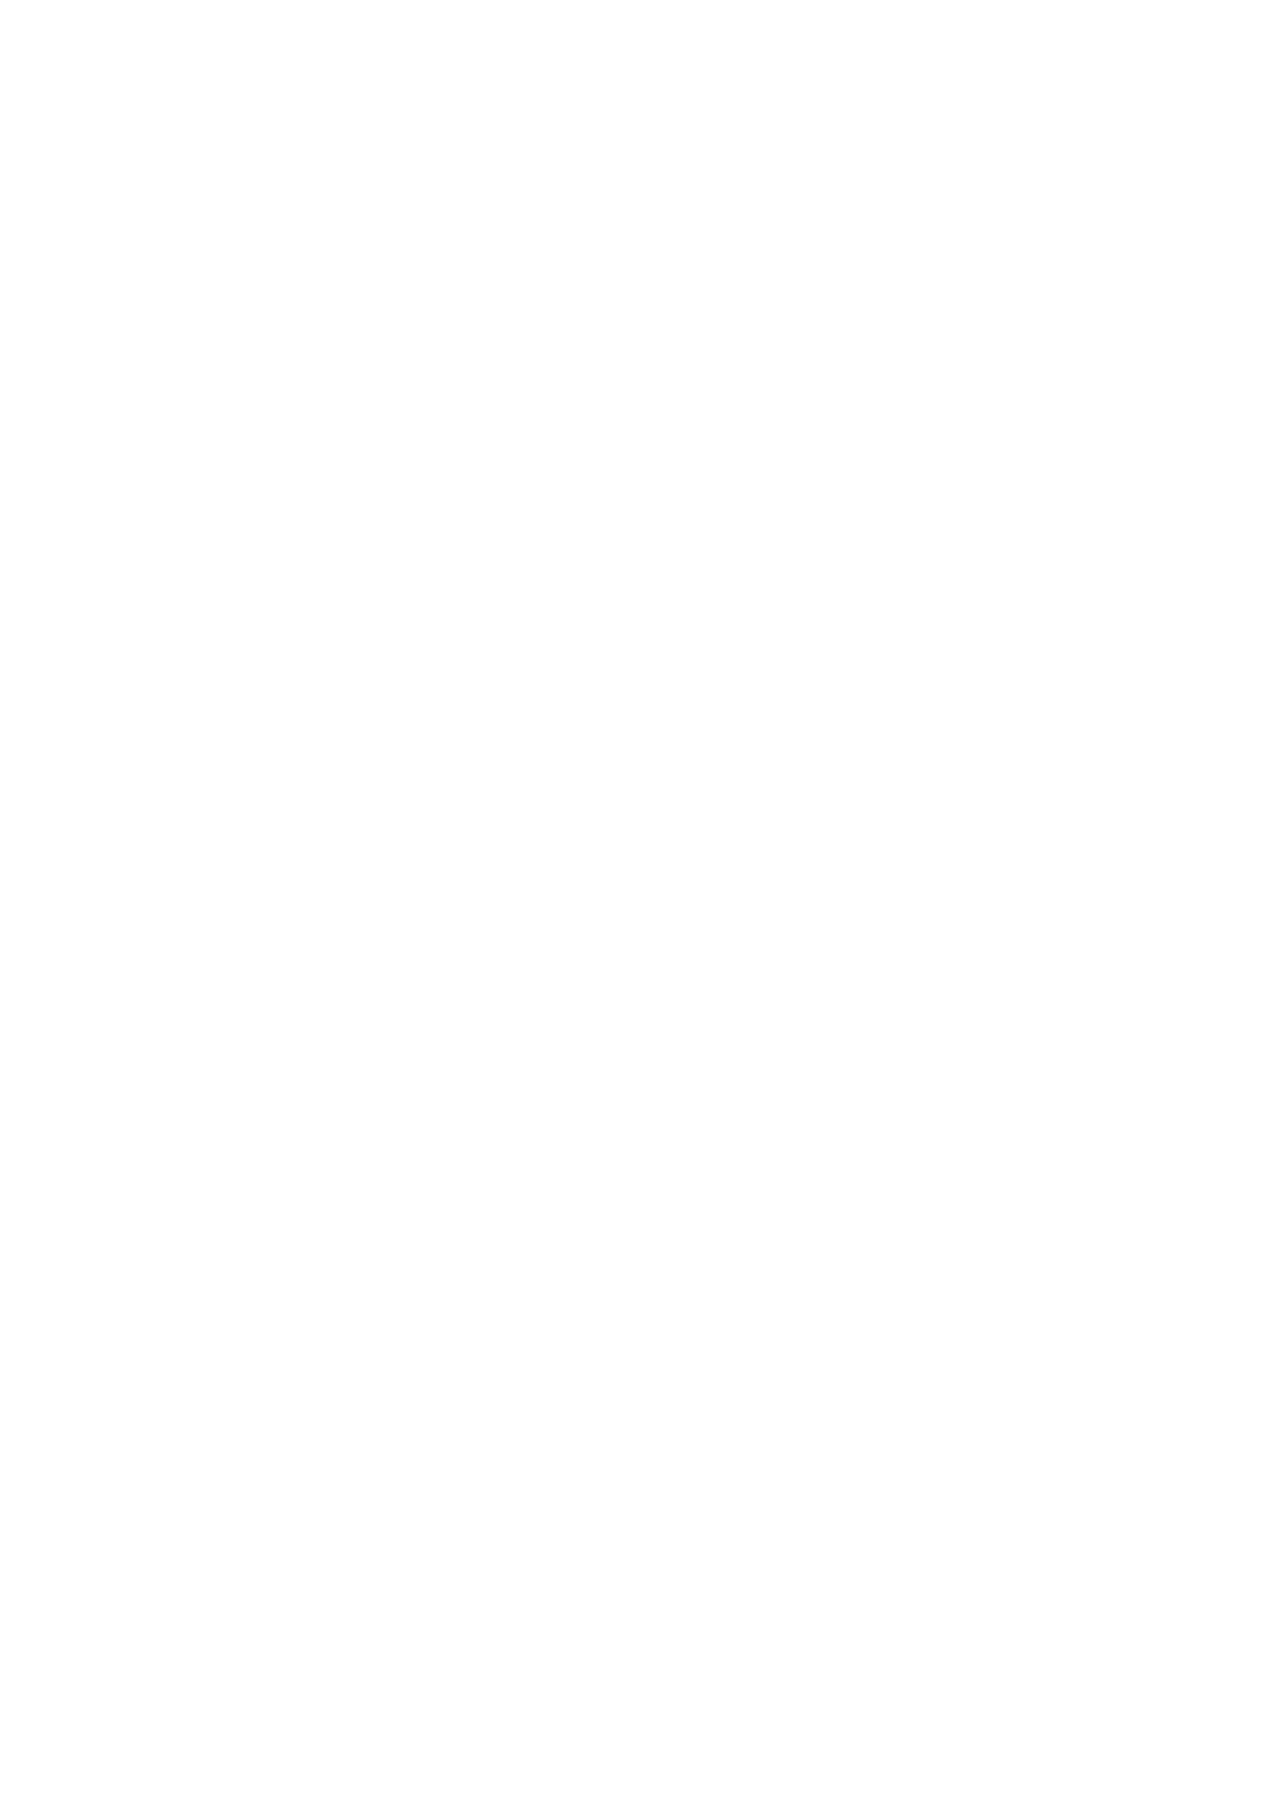 [AQUA SPACE (Asuka)] Kiriko-chan to Asobou! | Let's play with Kiriko-chan! (Sword Art Online) [English] [EHCOVE] [Digital] 1